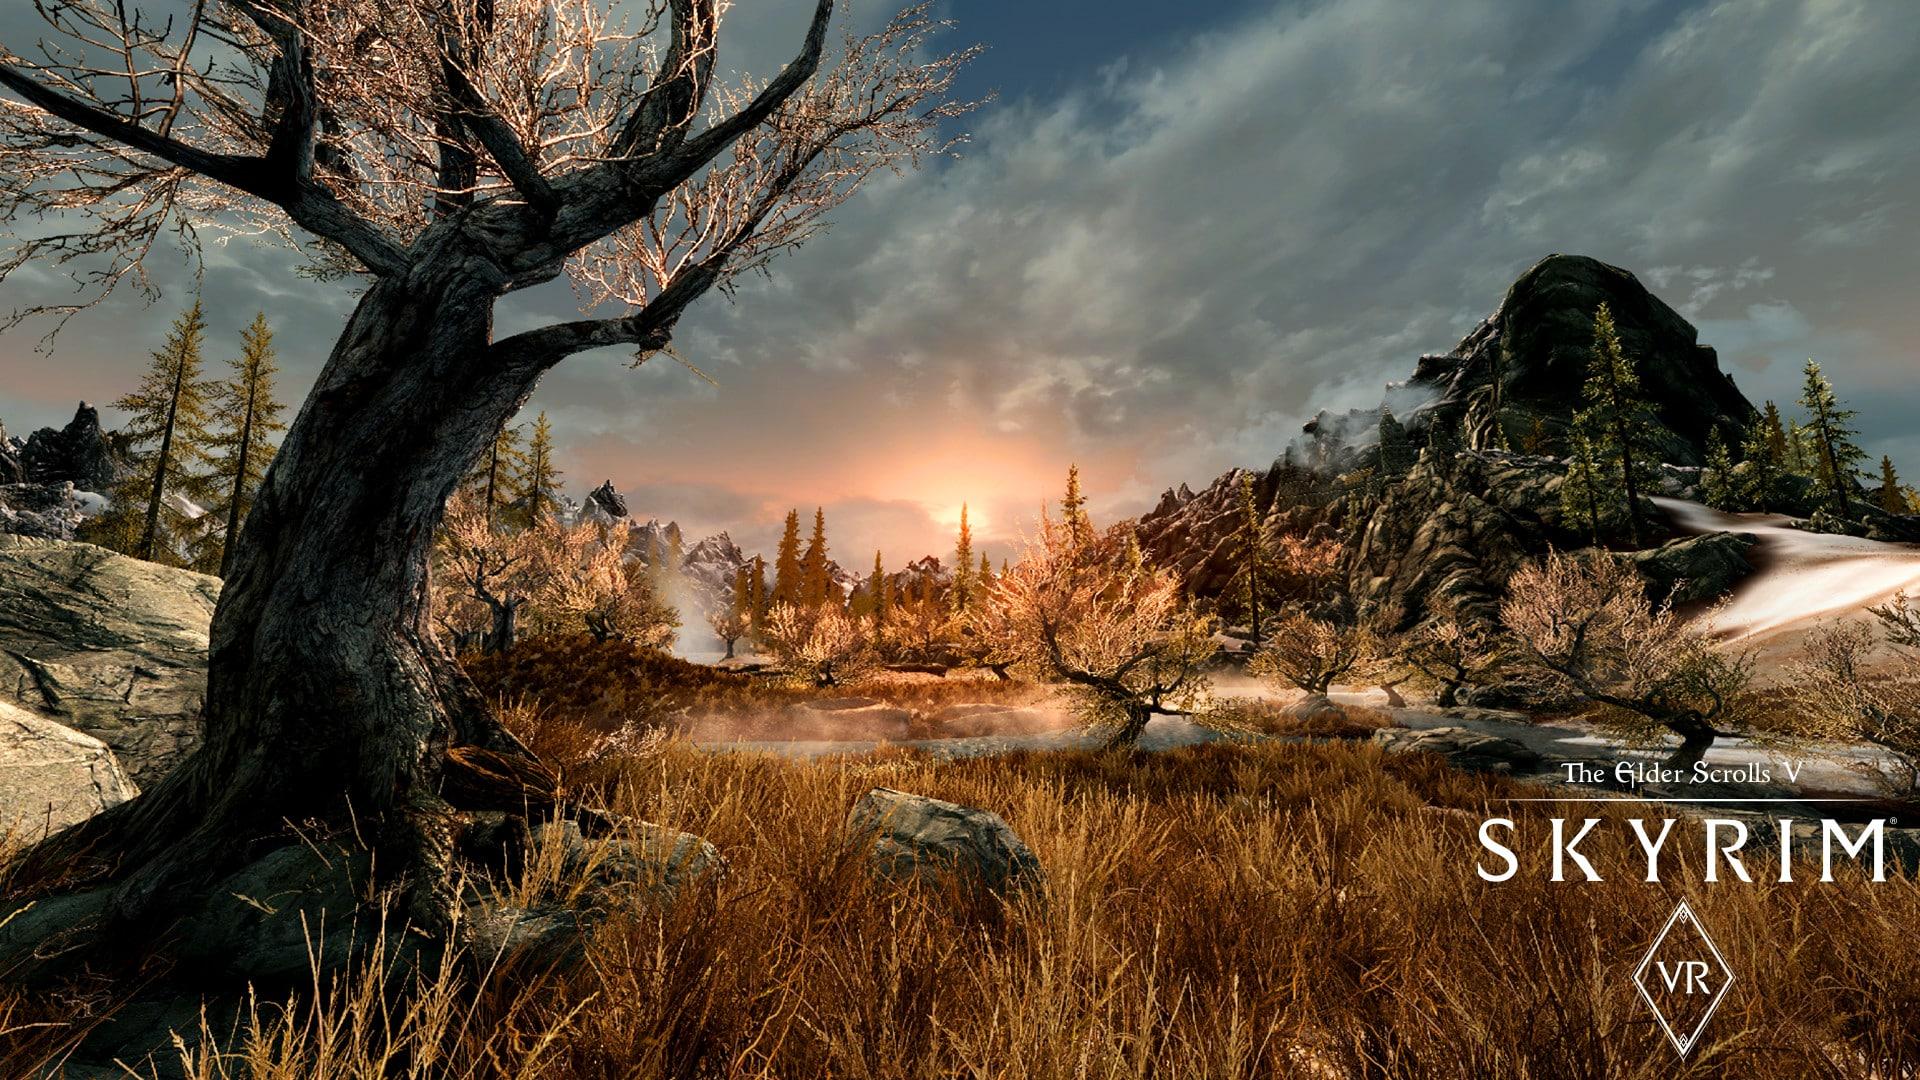 The Elder Scrolls V: Skyrim VR Steam Key GLOBAL - 2